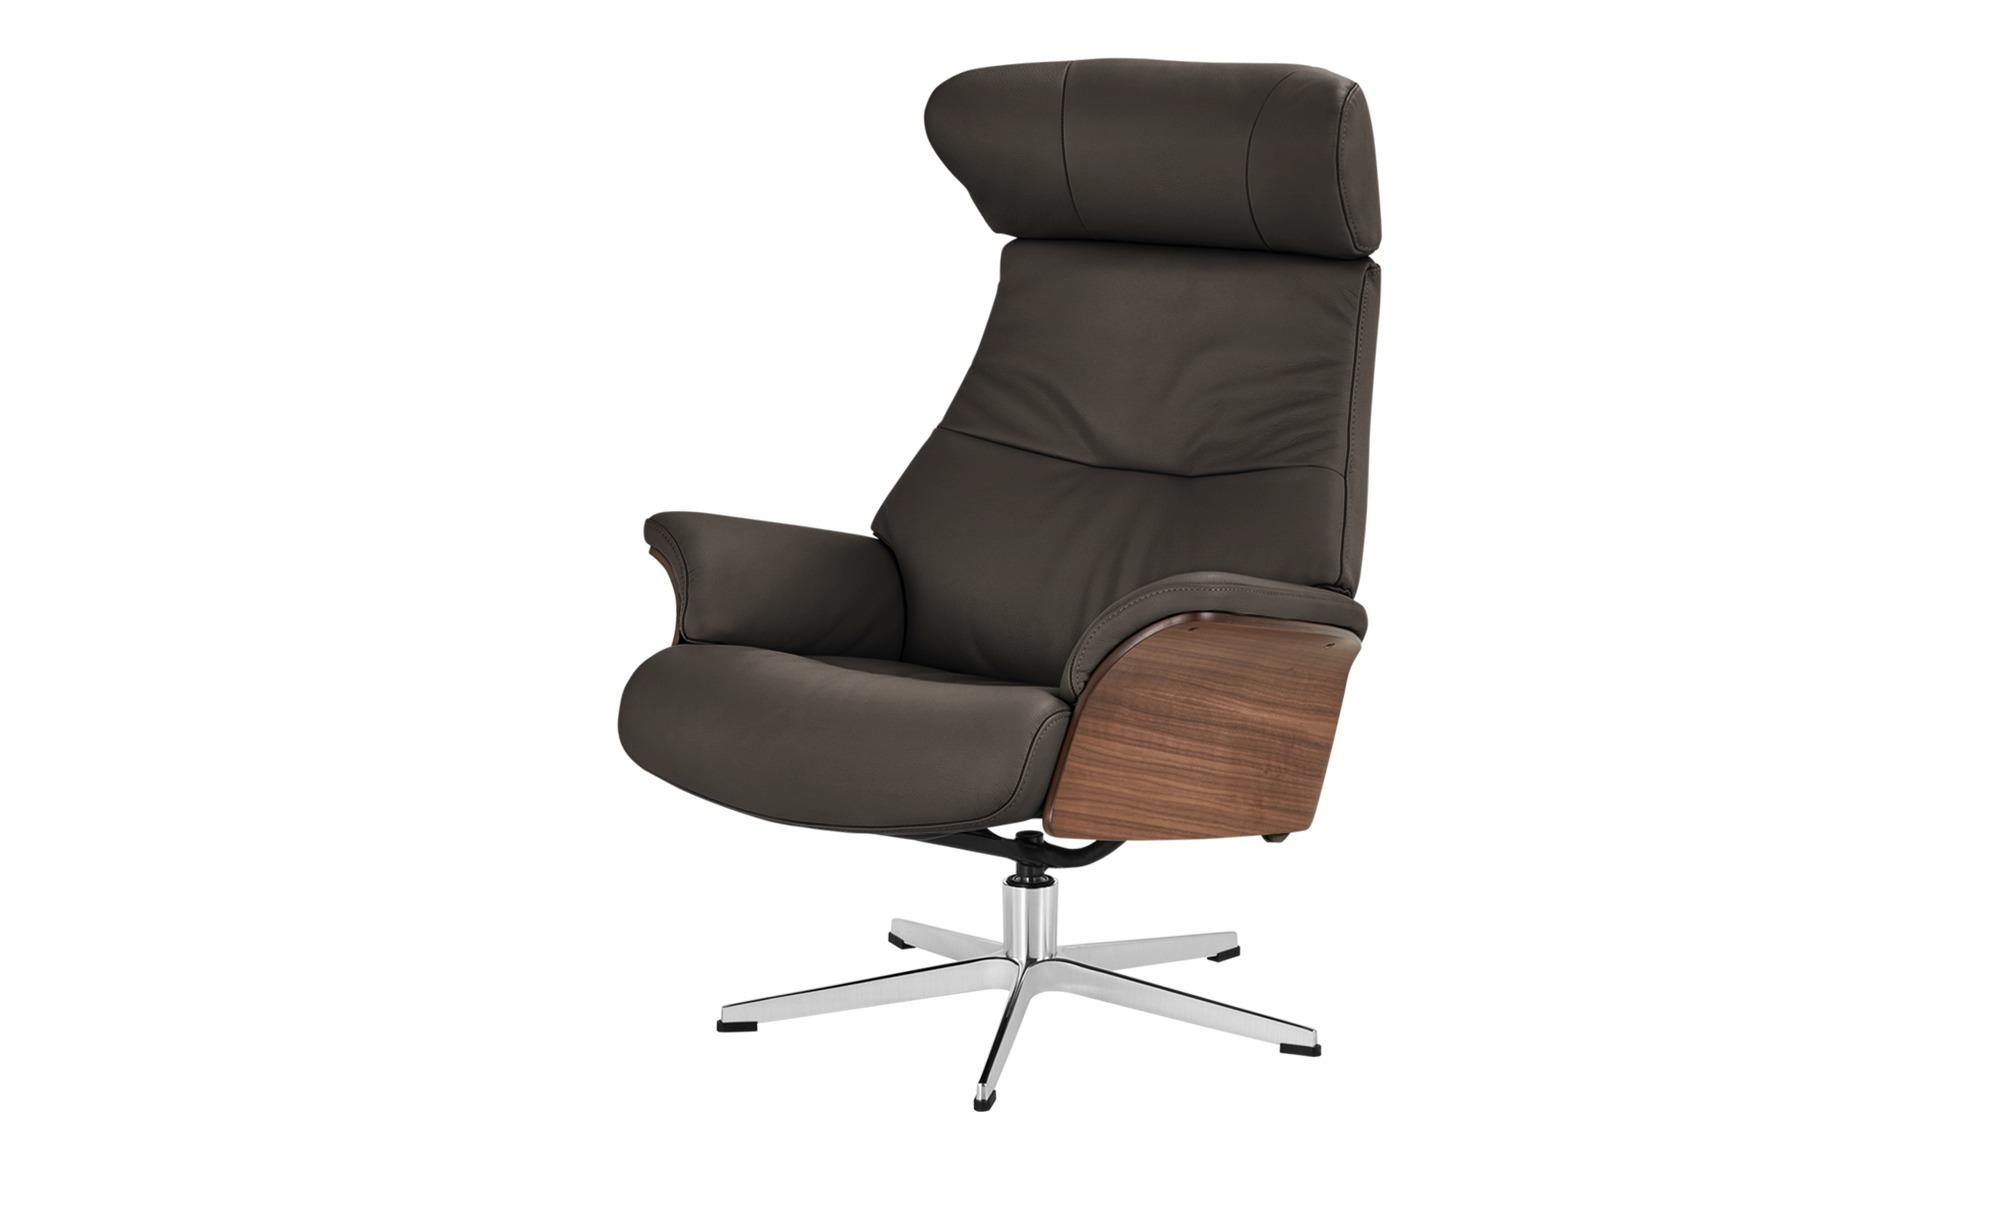 Relaxsessel braun - Leder Air ¦ braun ¦ Maße (cm): B: 80 H: 106 T: 78 Polstermöbel > Sessel > Fernsehsessel - Höffner